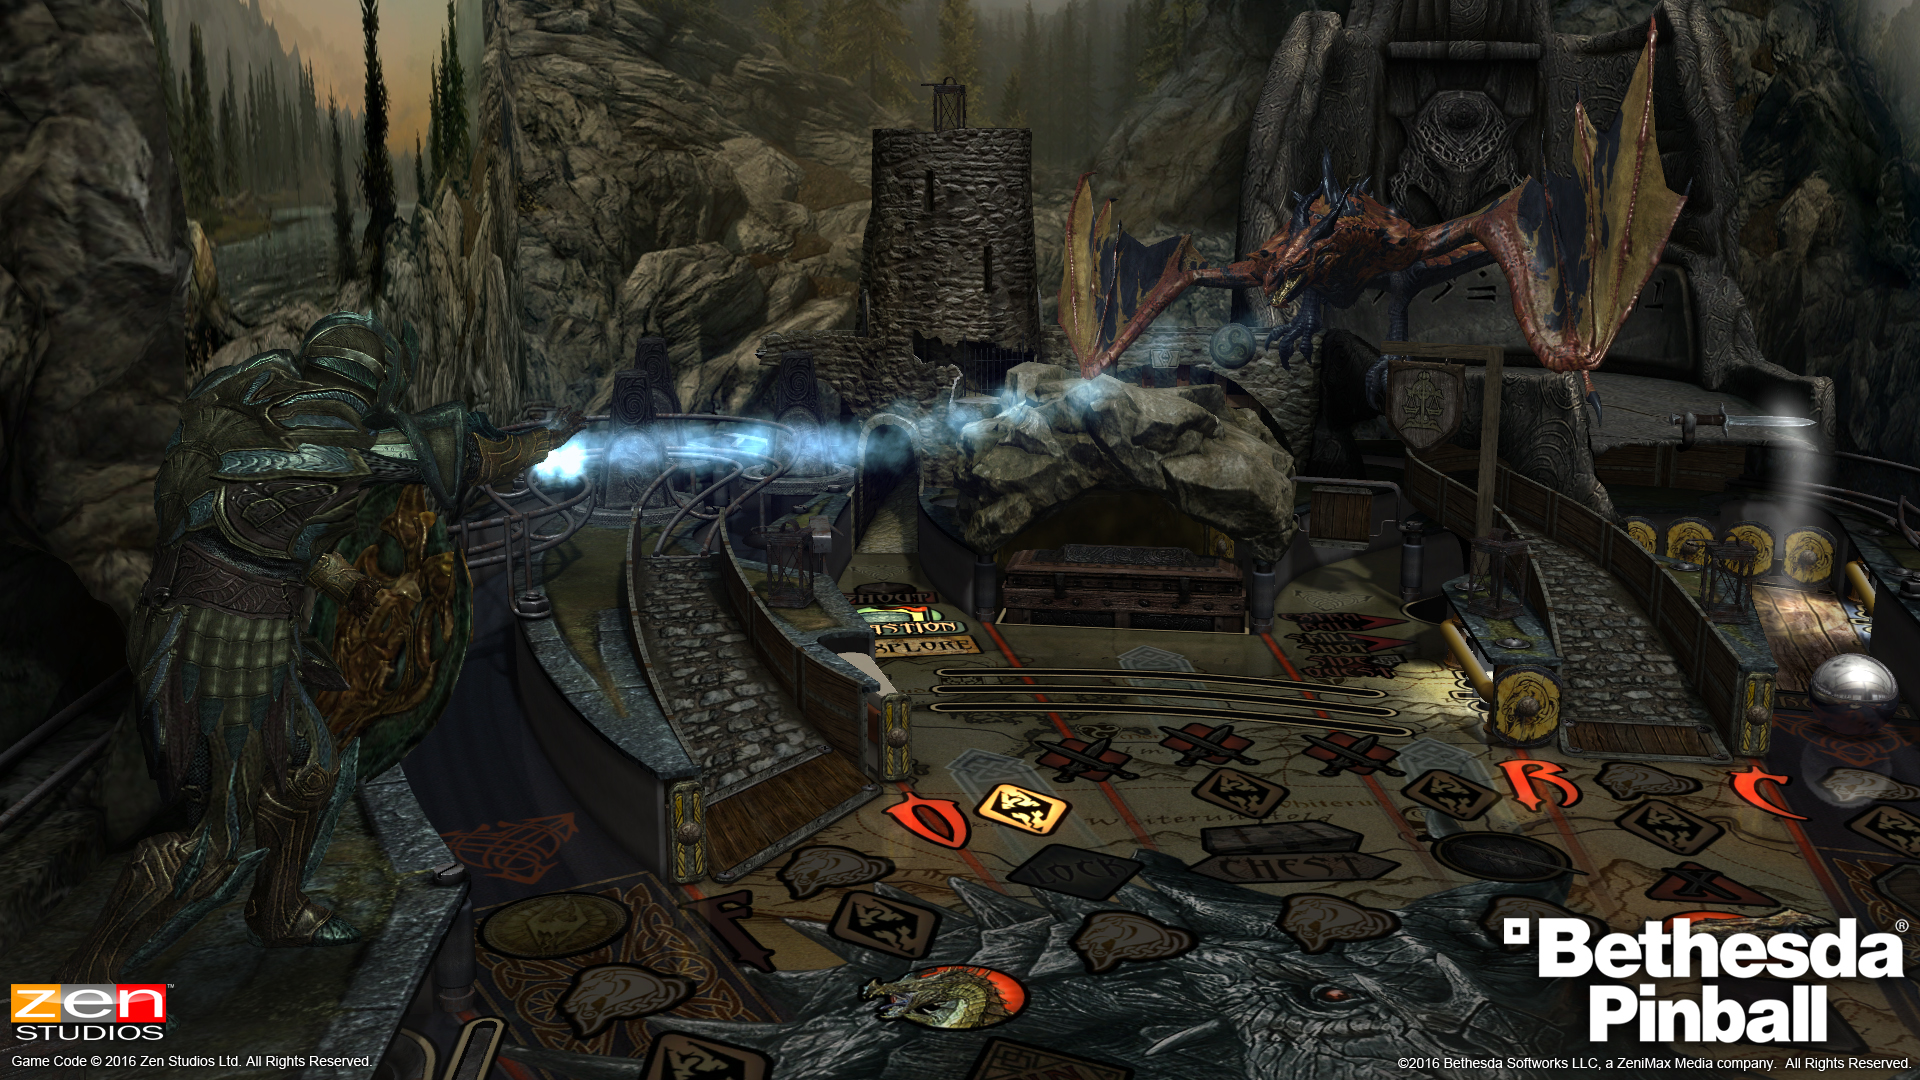 bethesda-pinball-screenshot-11